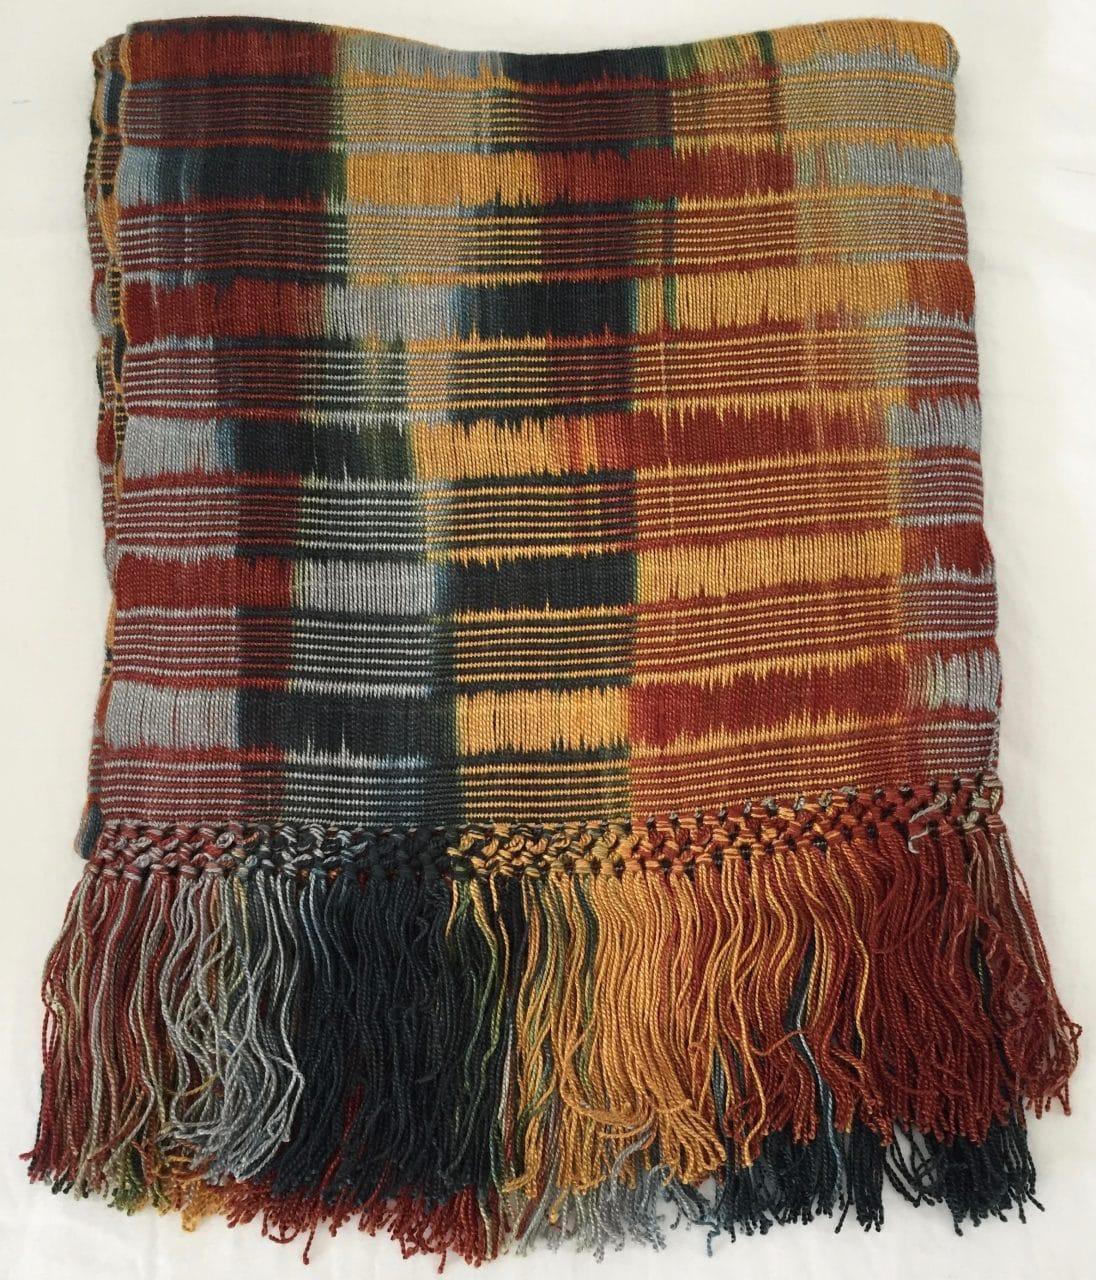 Gold, Burgundy, Black, White, Gray - Lightweight Bamboo Open-Weave Handwoven Scarf 8 x 68